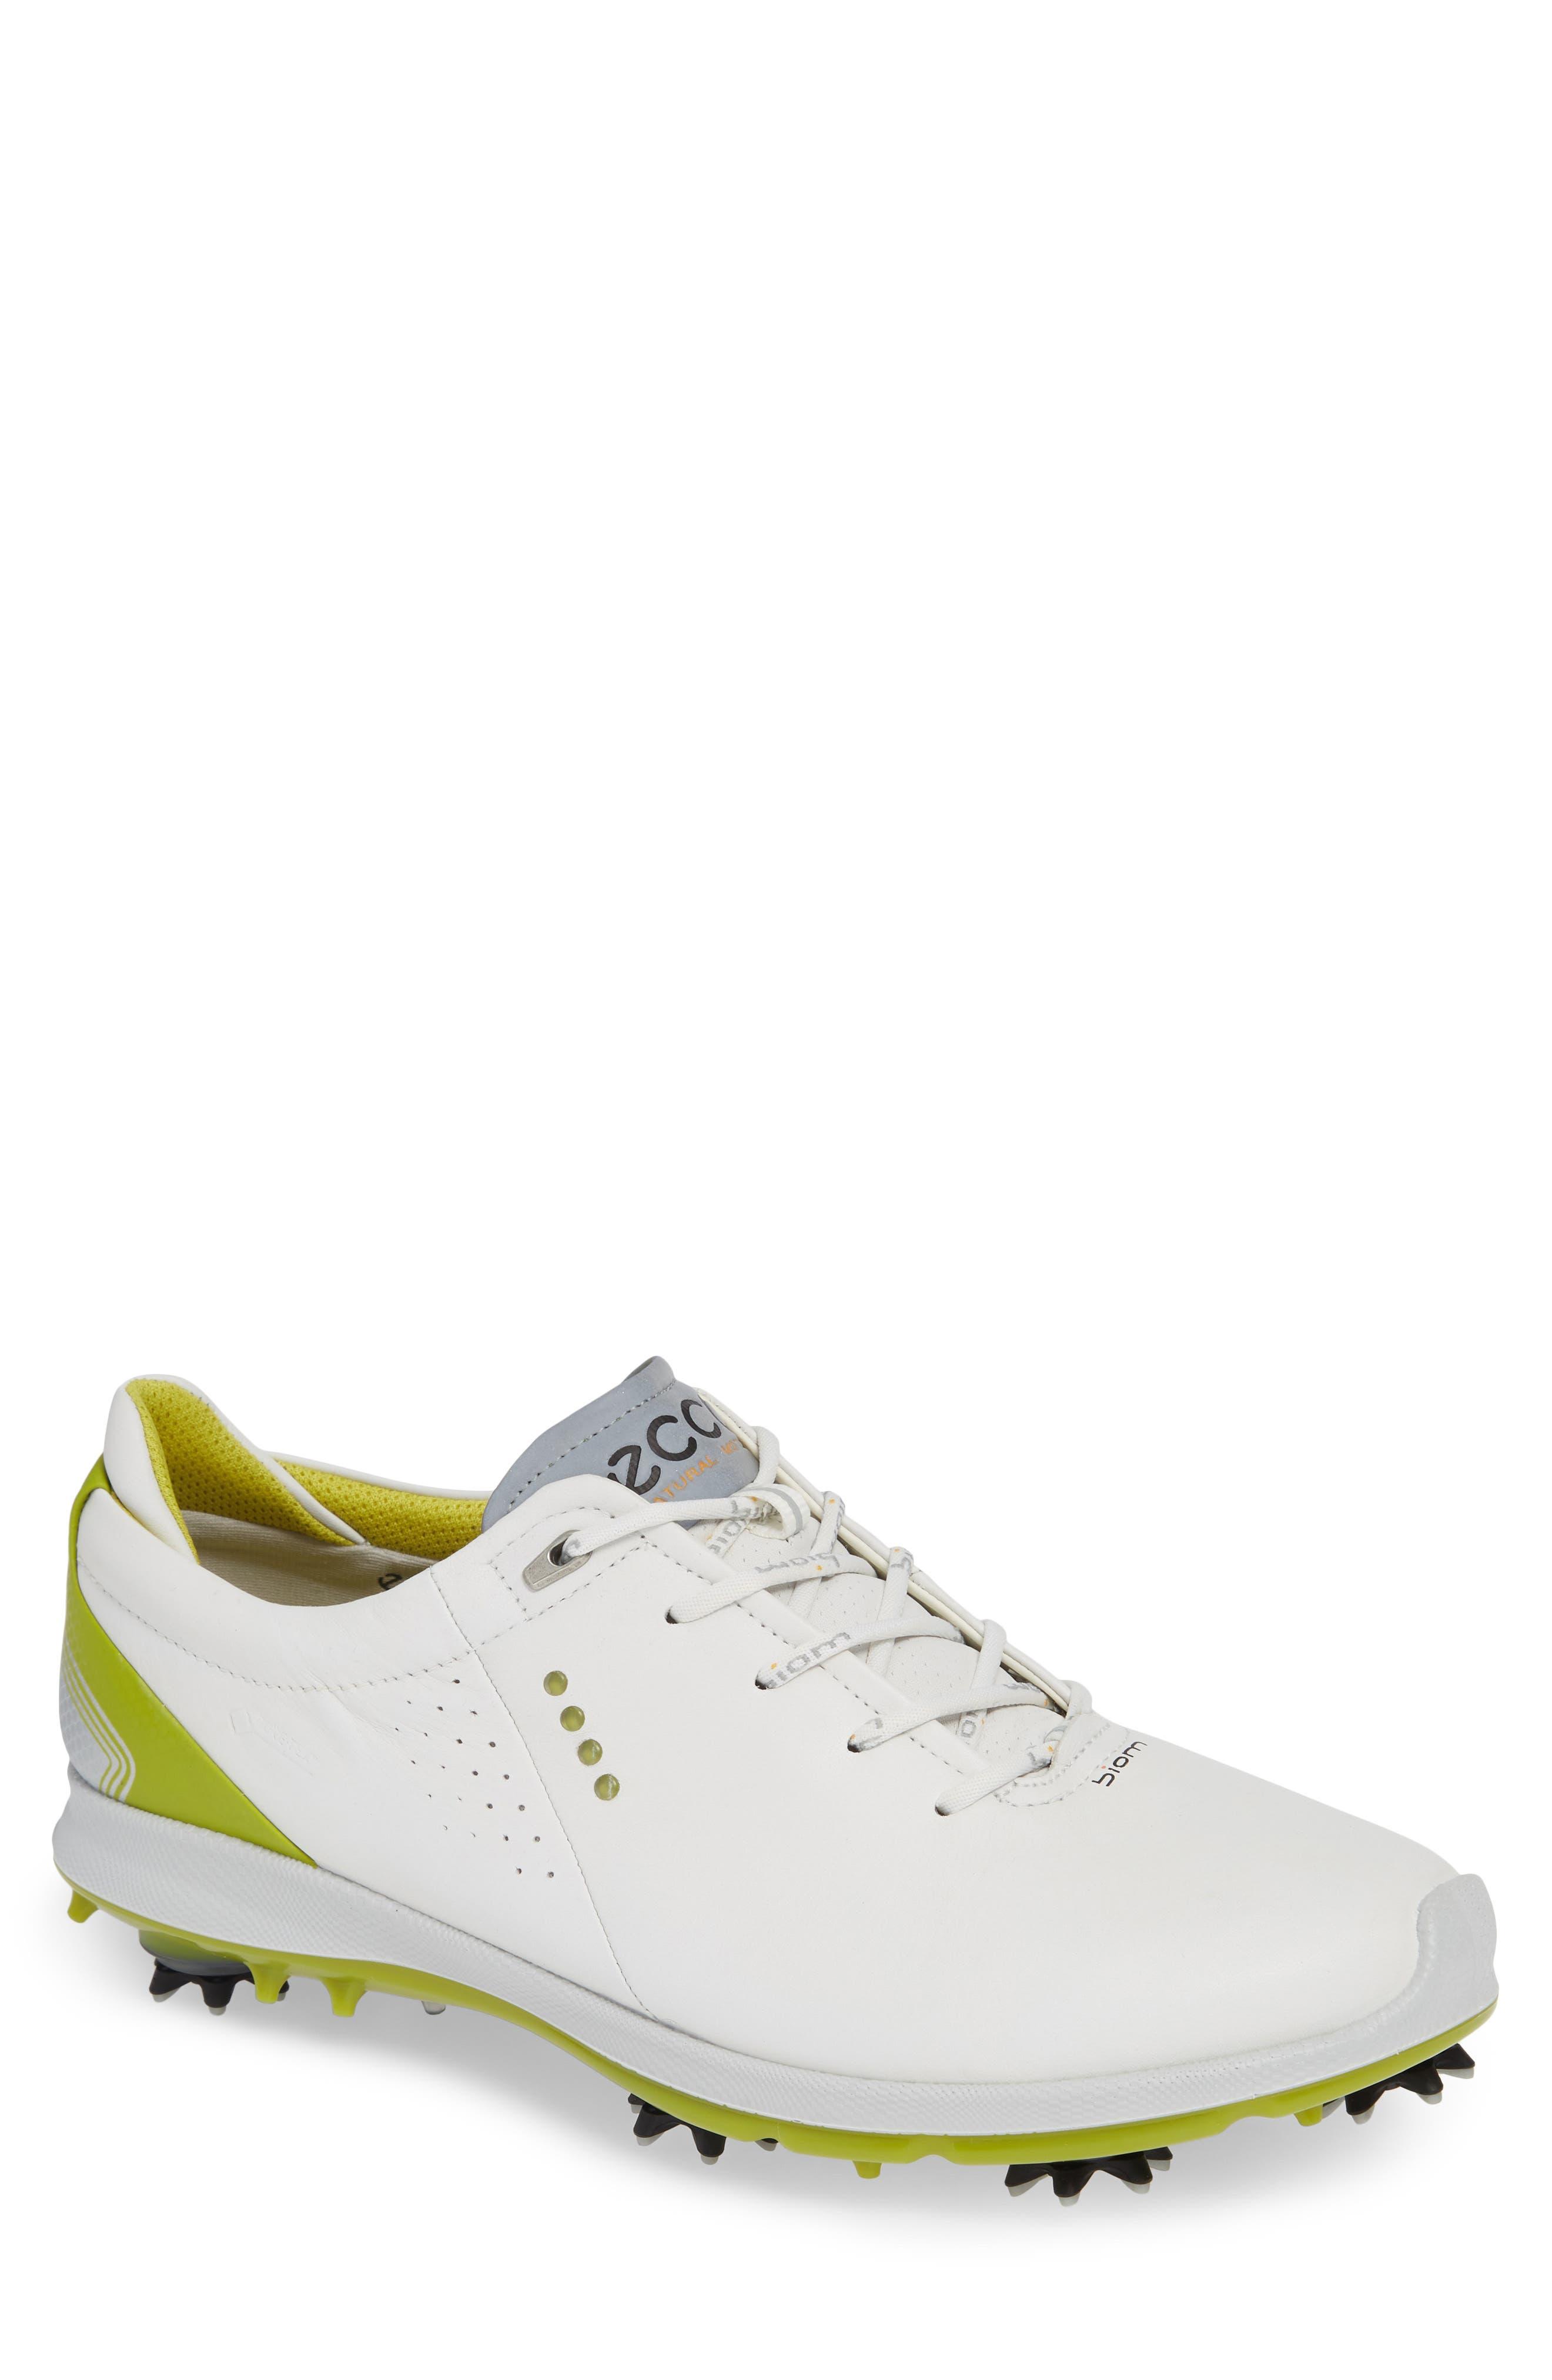 BIOM G 2 Free Gore-Tex<sup>®</sup> Golf Shoe,                             Main thumbnail 1, color,                             WHITE/ KIWI LEATHER